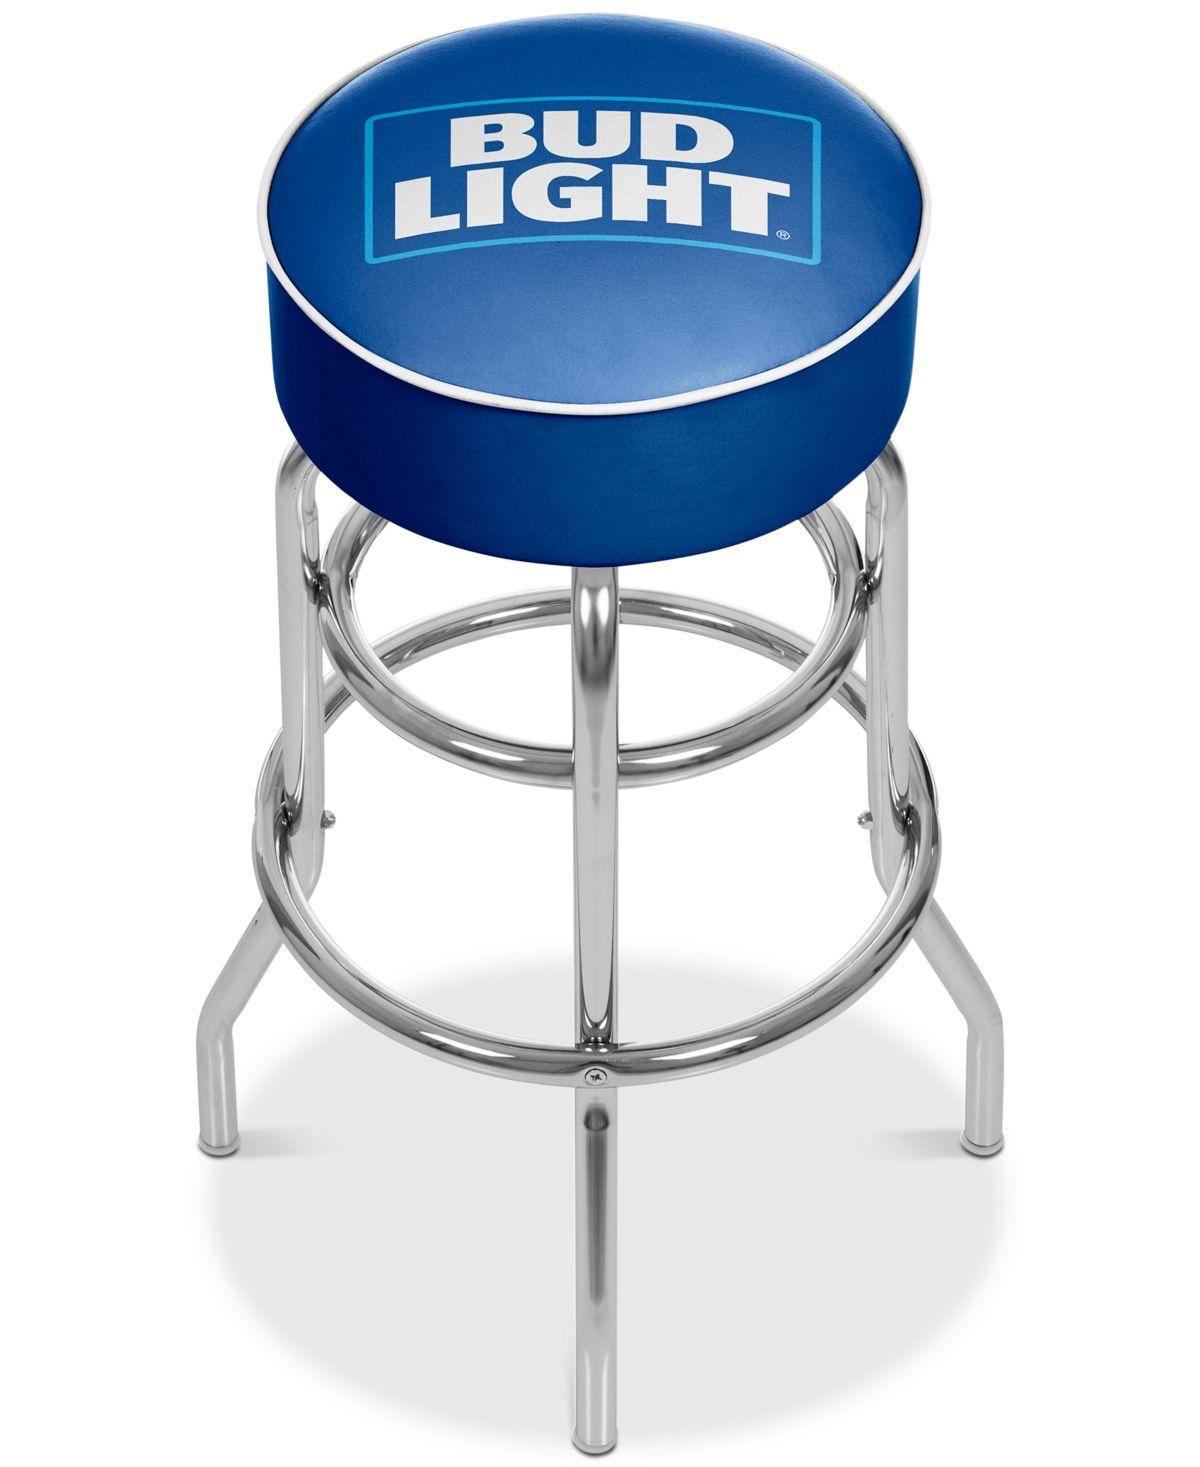 Bud Light Blue Bar Stool Medium Blue Chrome Bar Stools Swivel Bar Stools